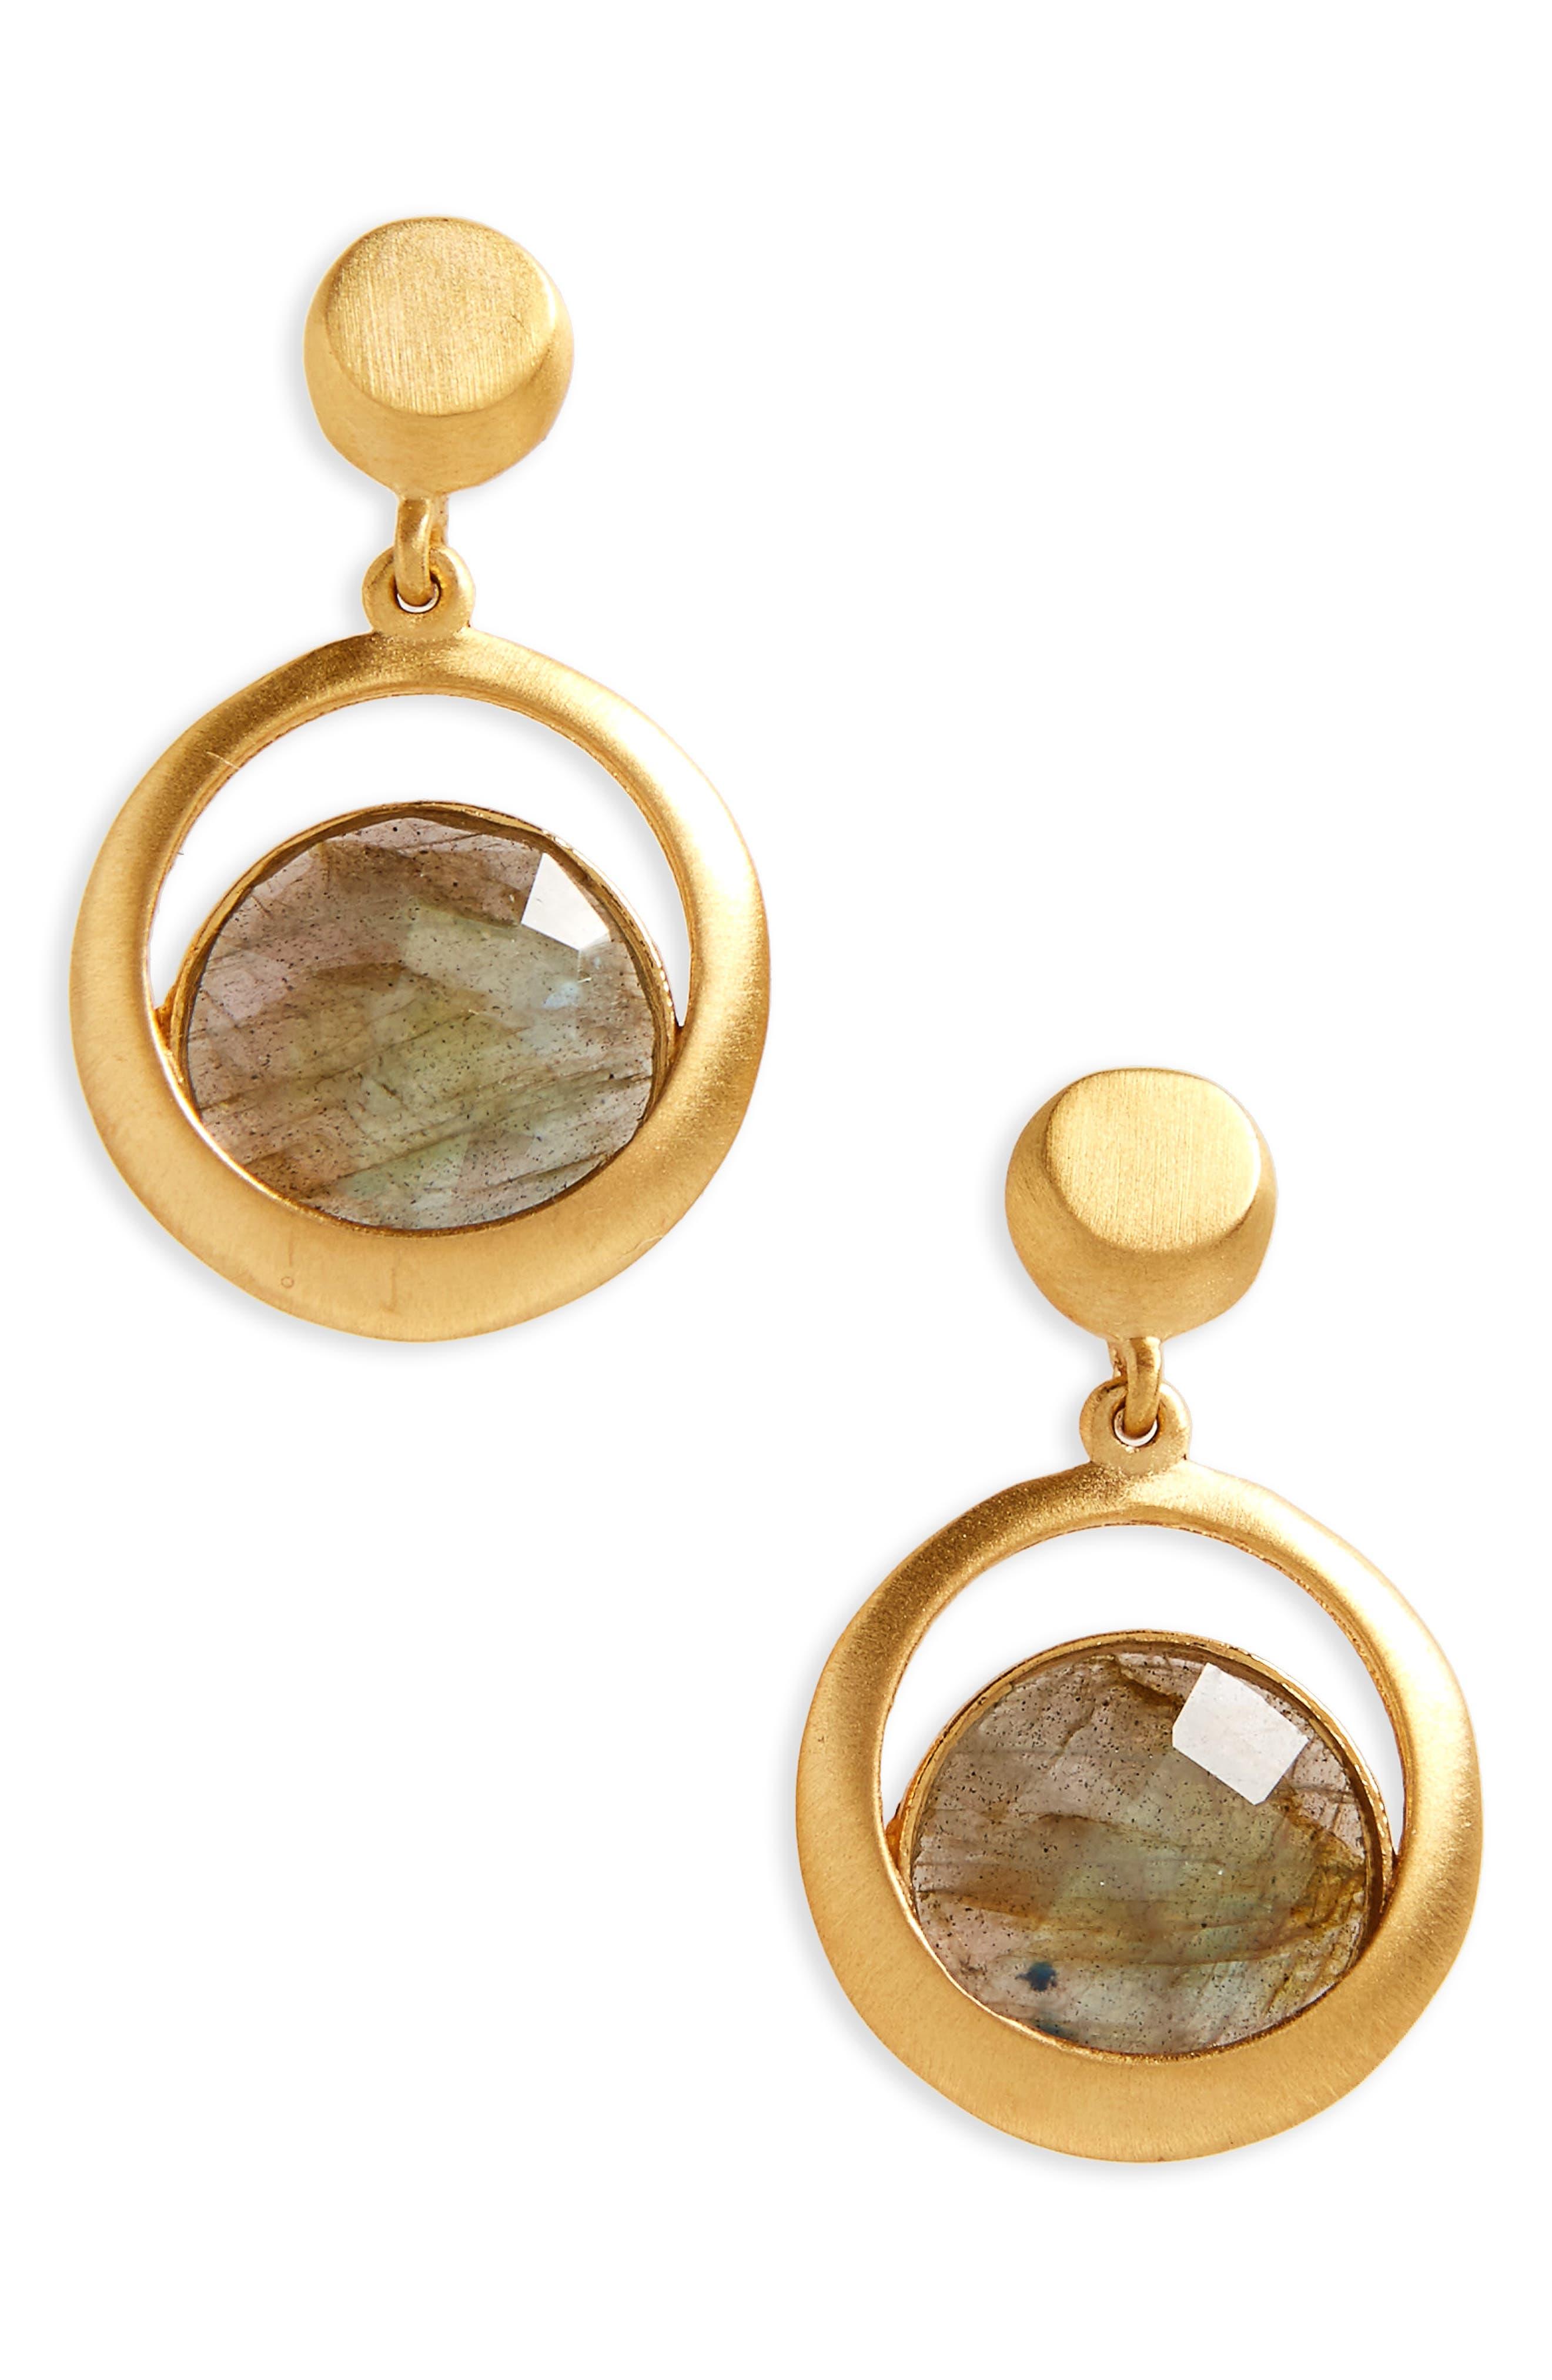 Lapa Semiprecious Stone Drop Earrings,                             Main thumbnail 1, color,                             Labradorite/ Gold